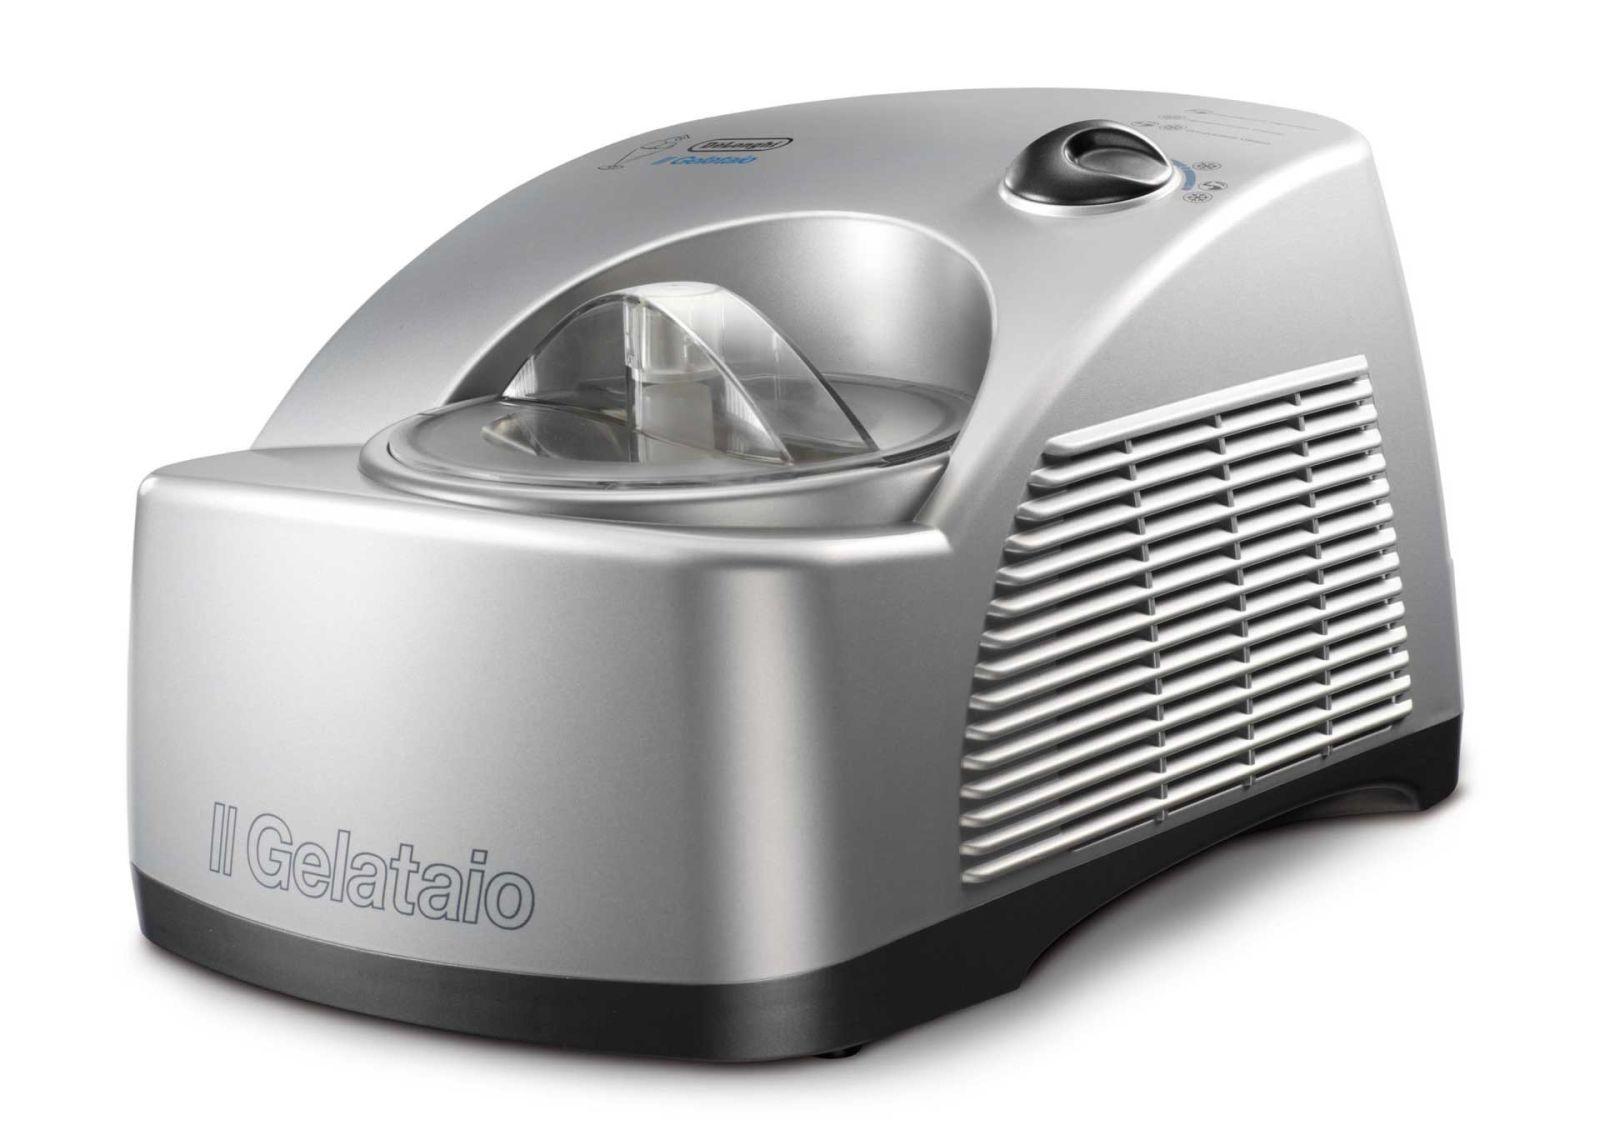 delonghi self refrigerating gelato maker model gm6000